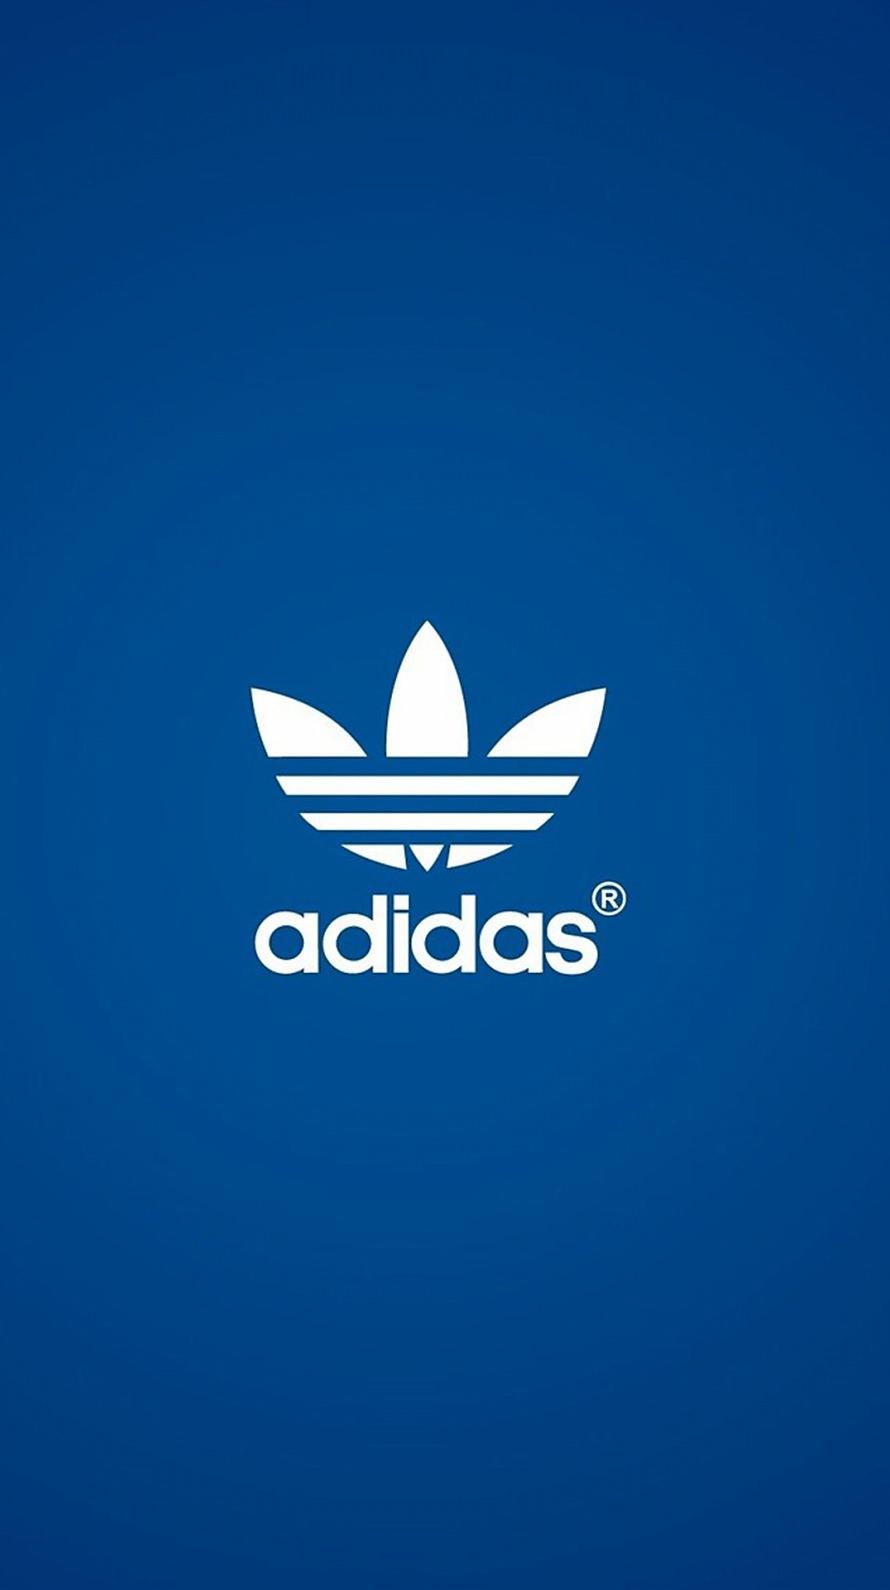 Adidas アディダス ロゴ Iphone6壁紙 Wallpaperbox